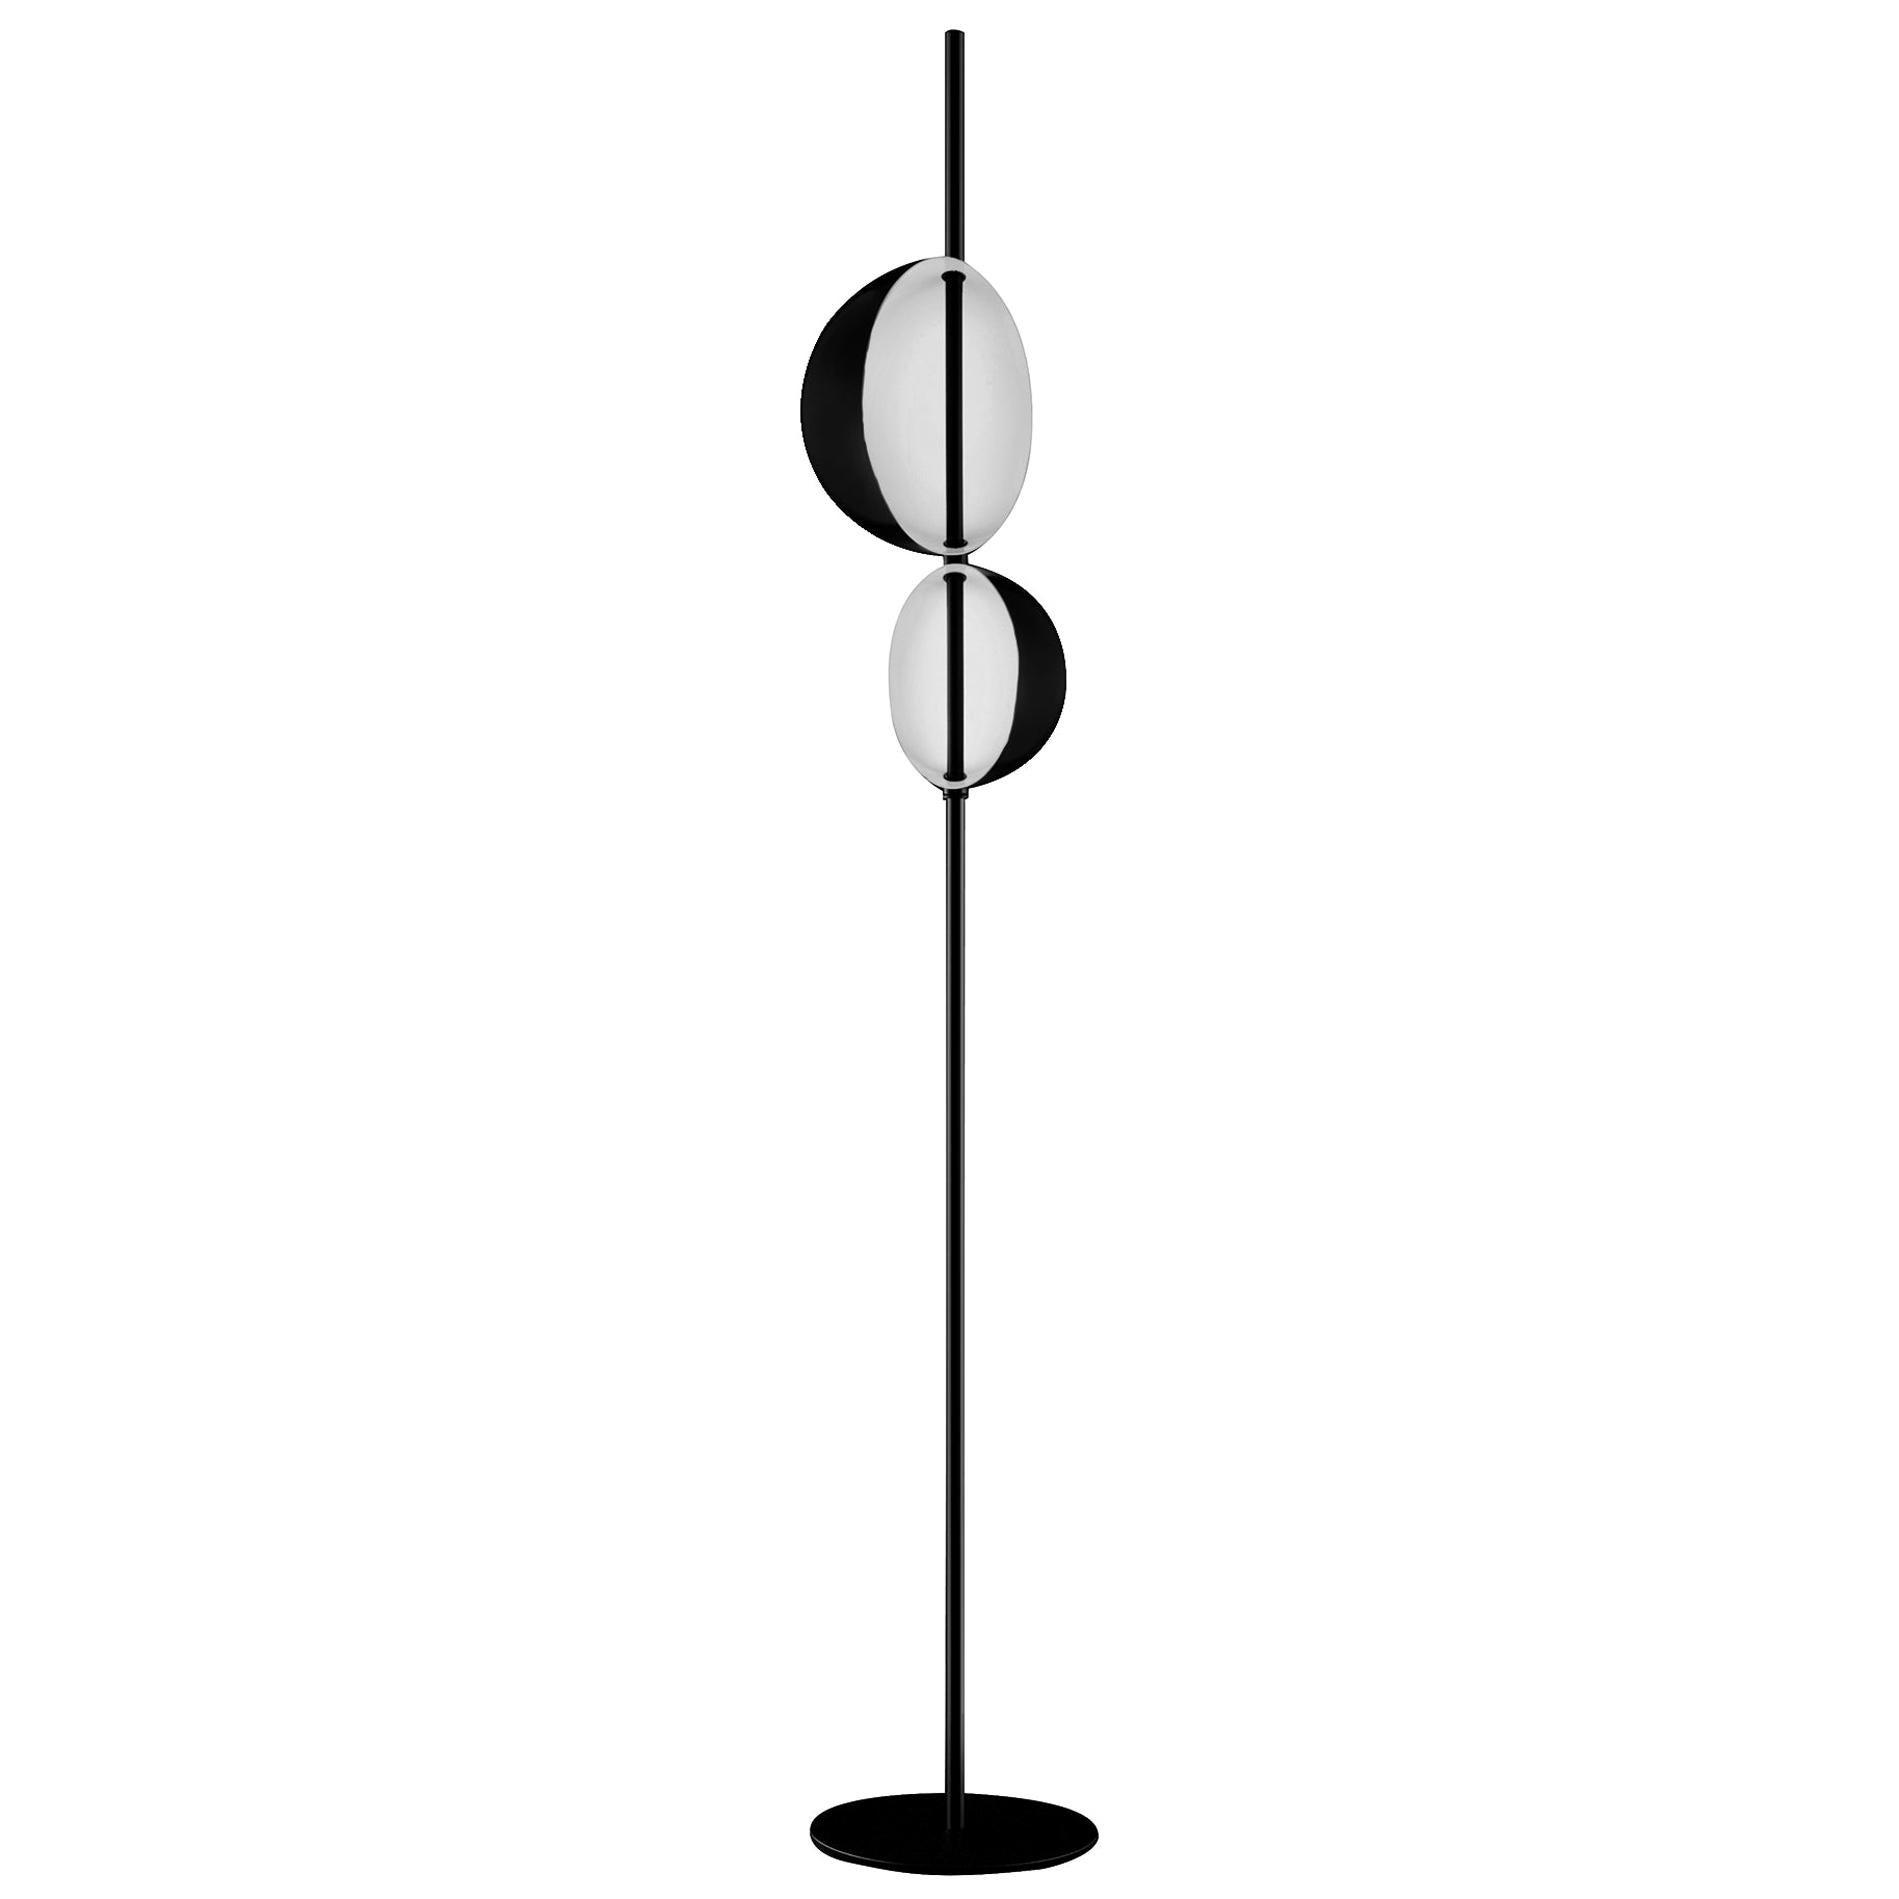 Victor Vaisilev Black Floor Lamp 'Superluna' by Oluce